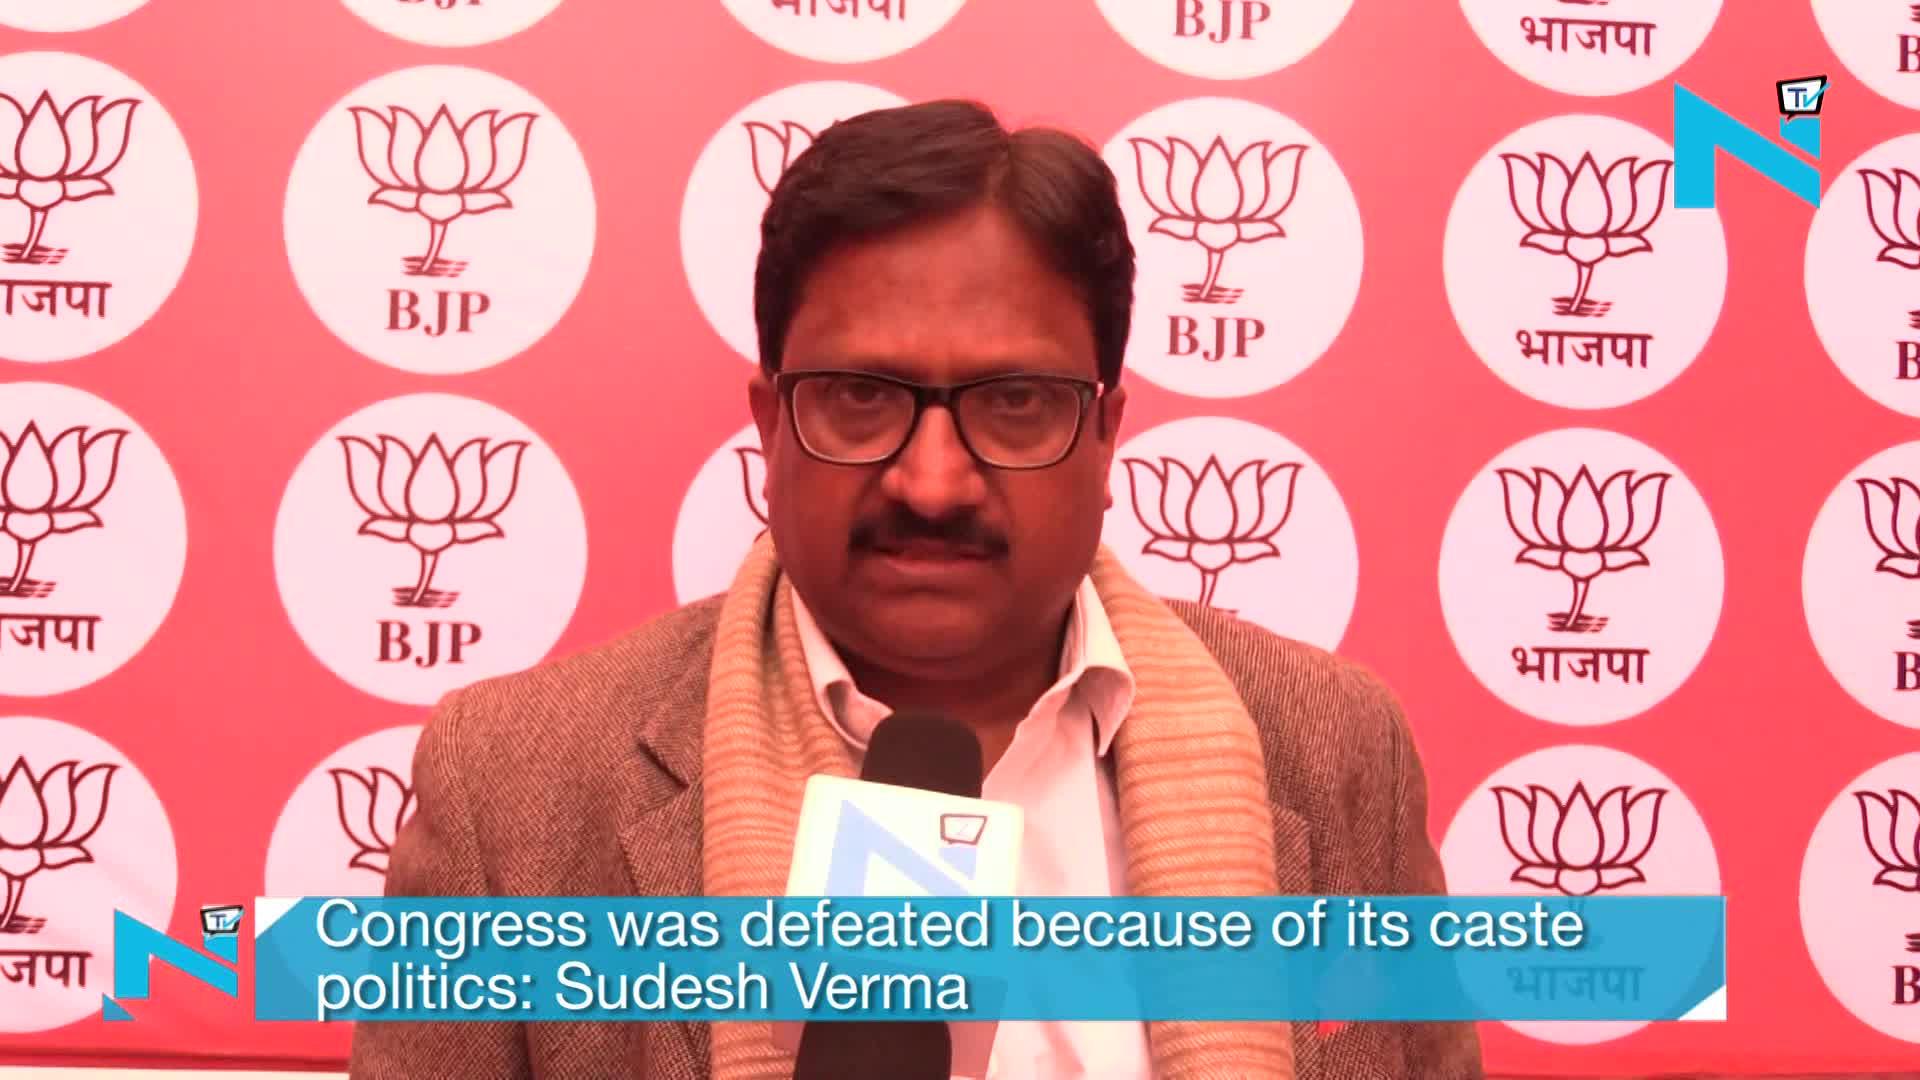 Congress was defeated because of its caste politics: Sudesh Verma